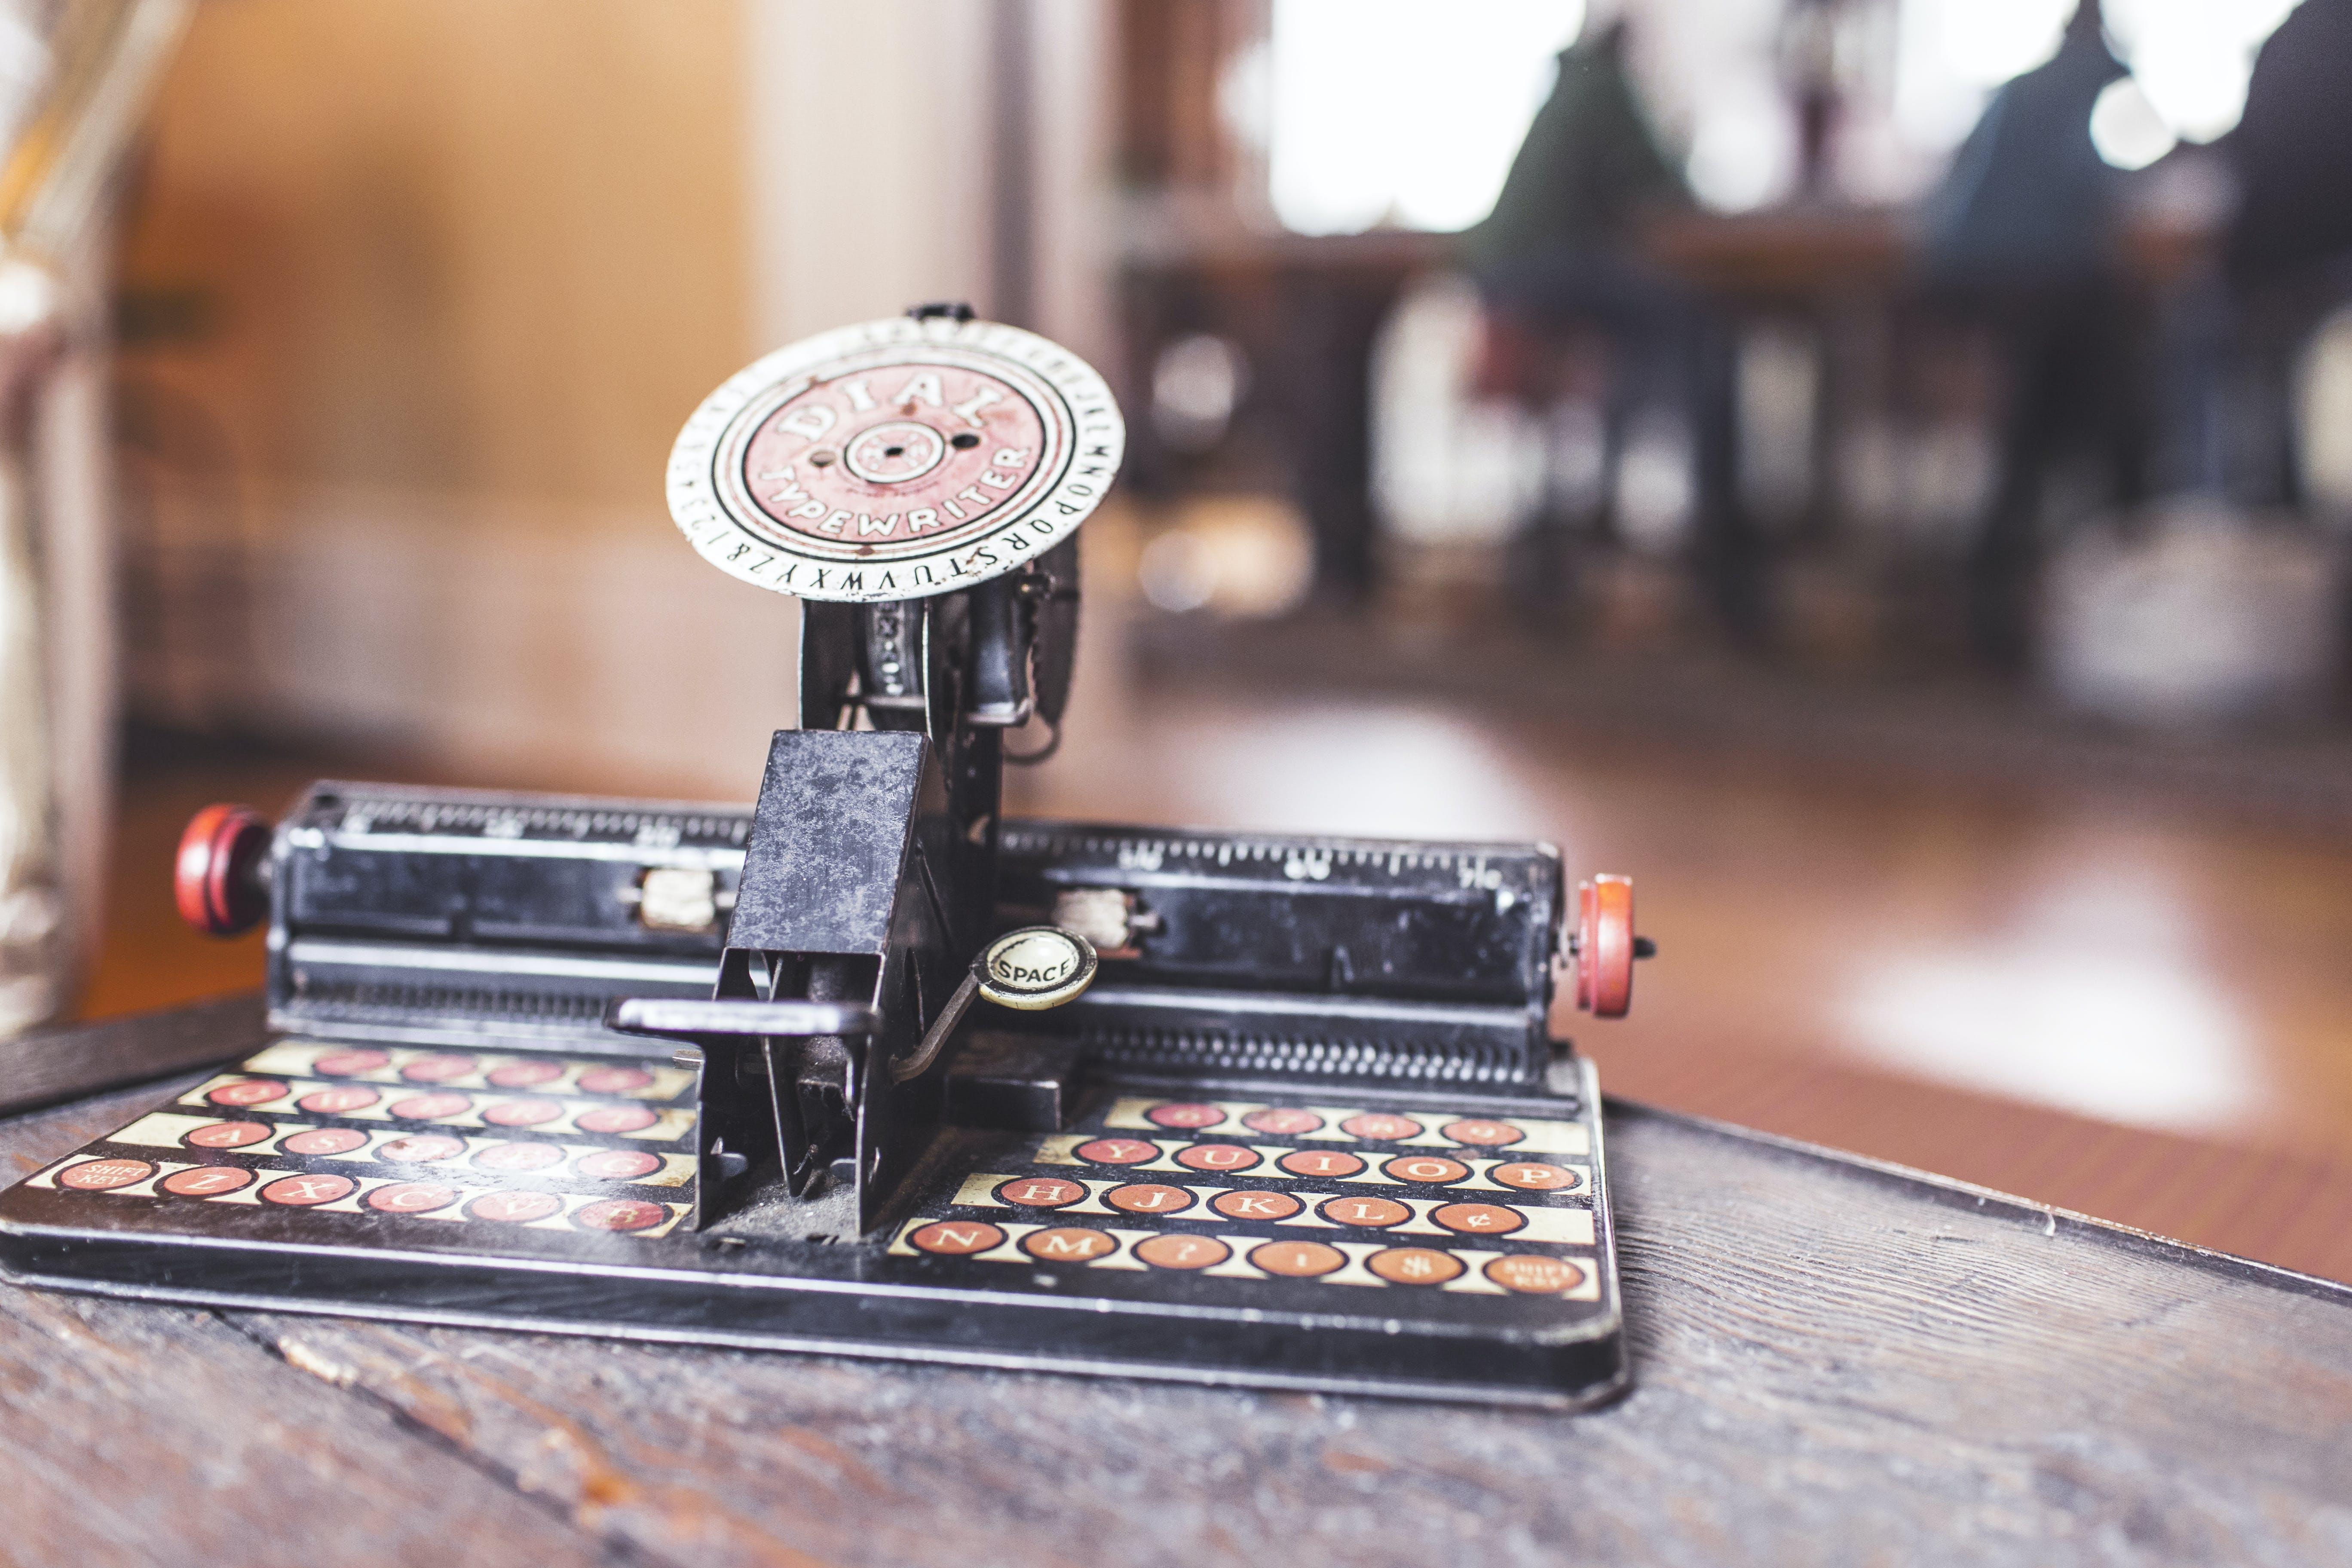 antiek, keyboard, schrijfmachine